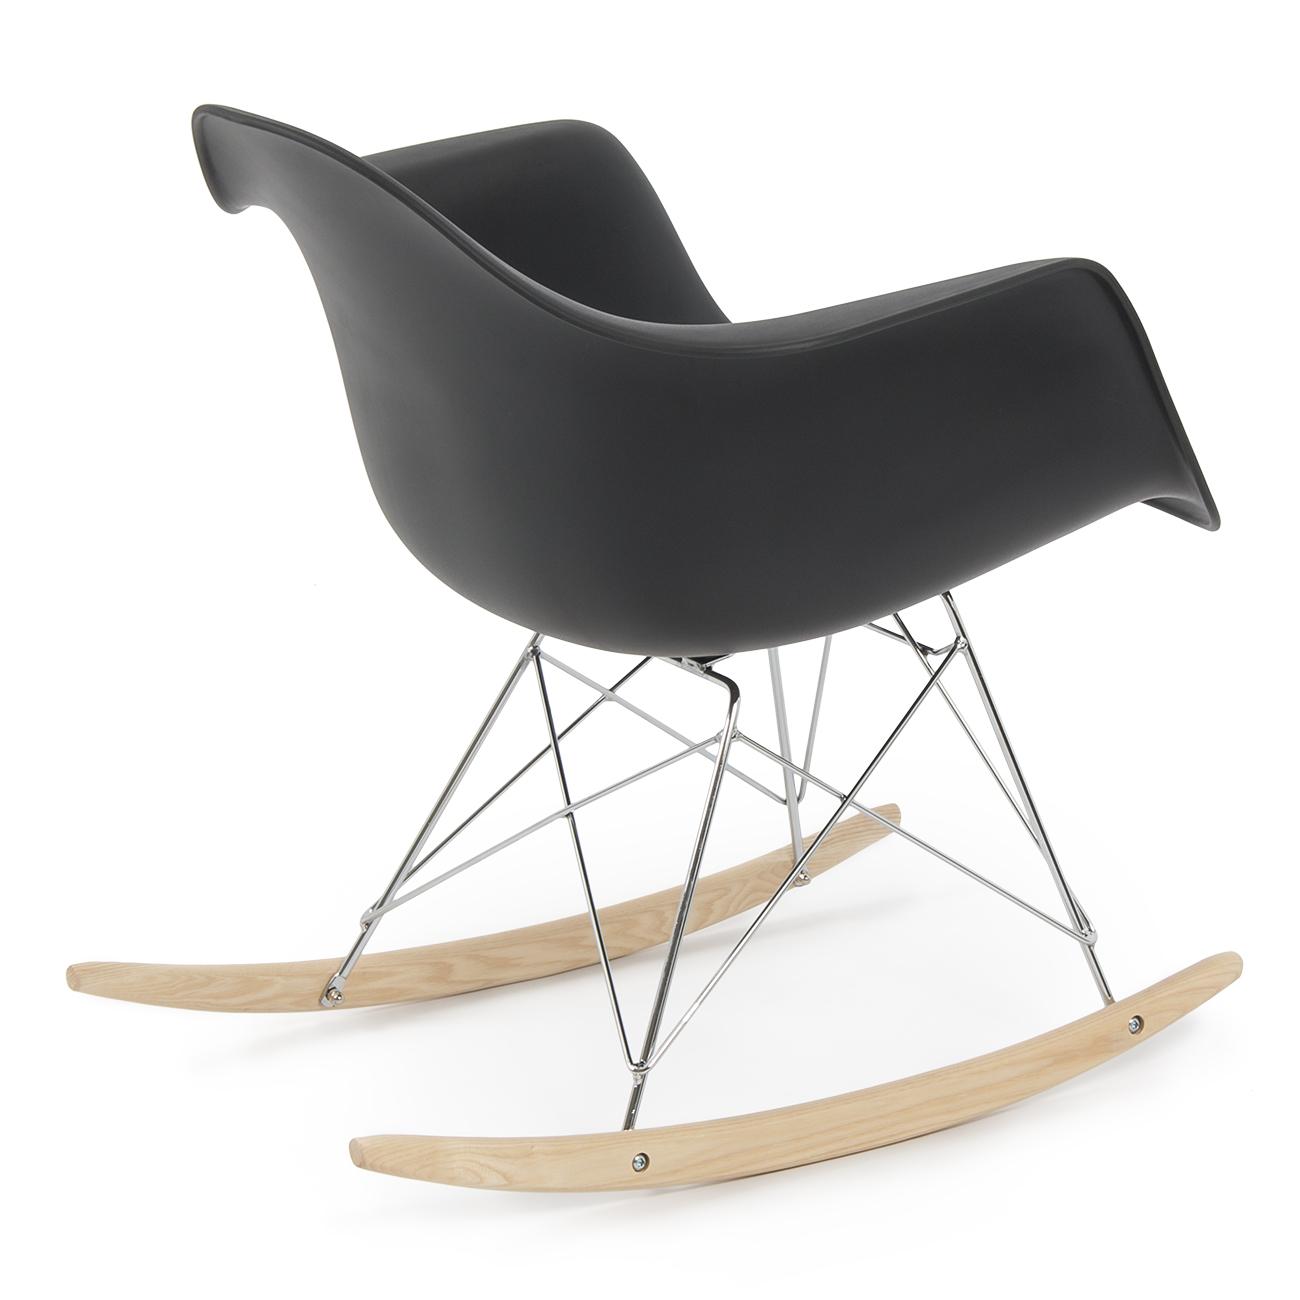 modern rocking chair singapore steel price philippines retro dsw style arm rar rocker chairs